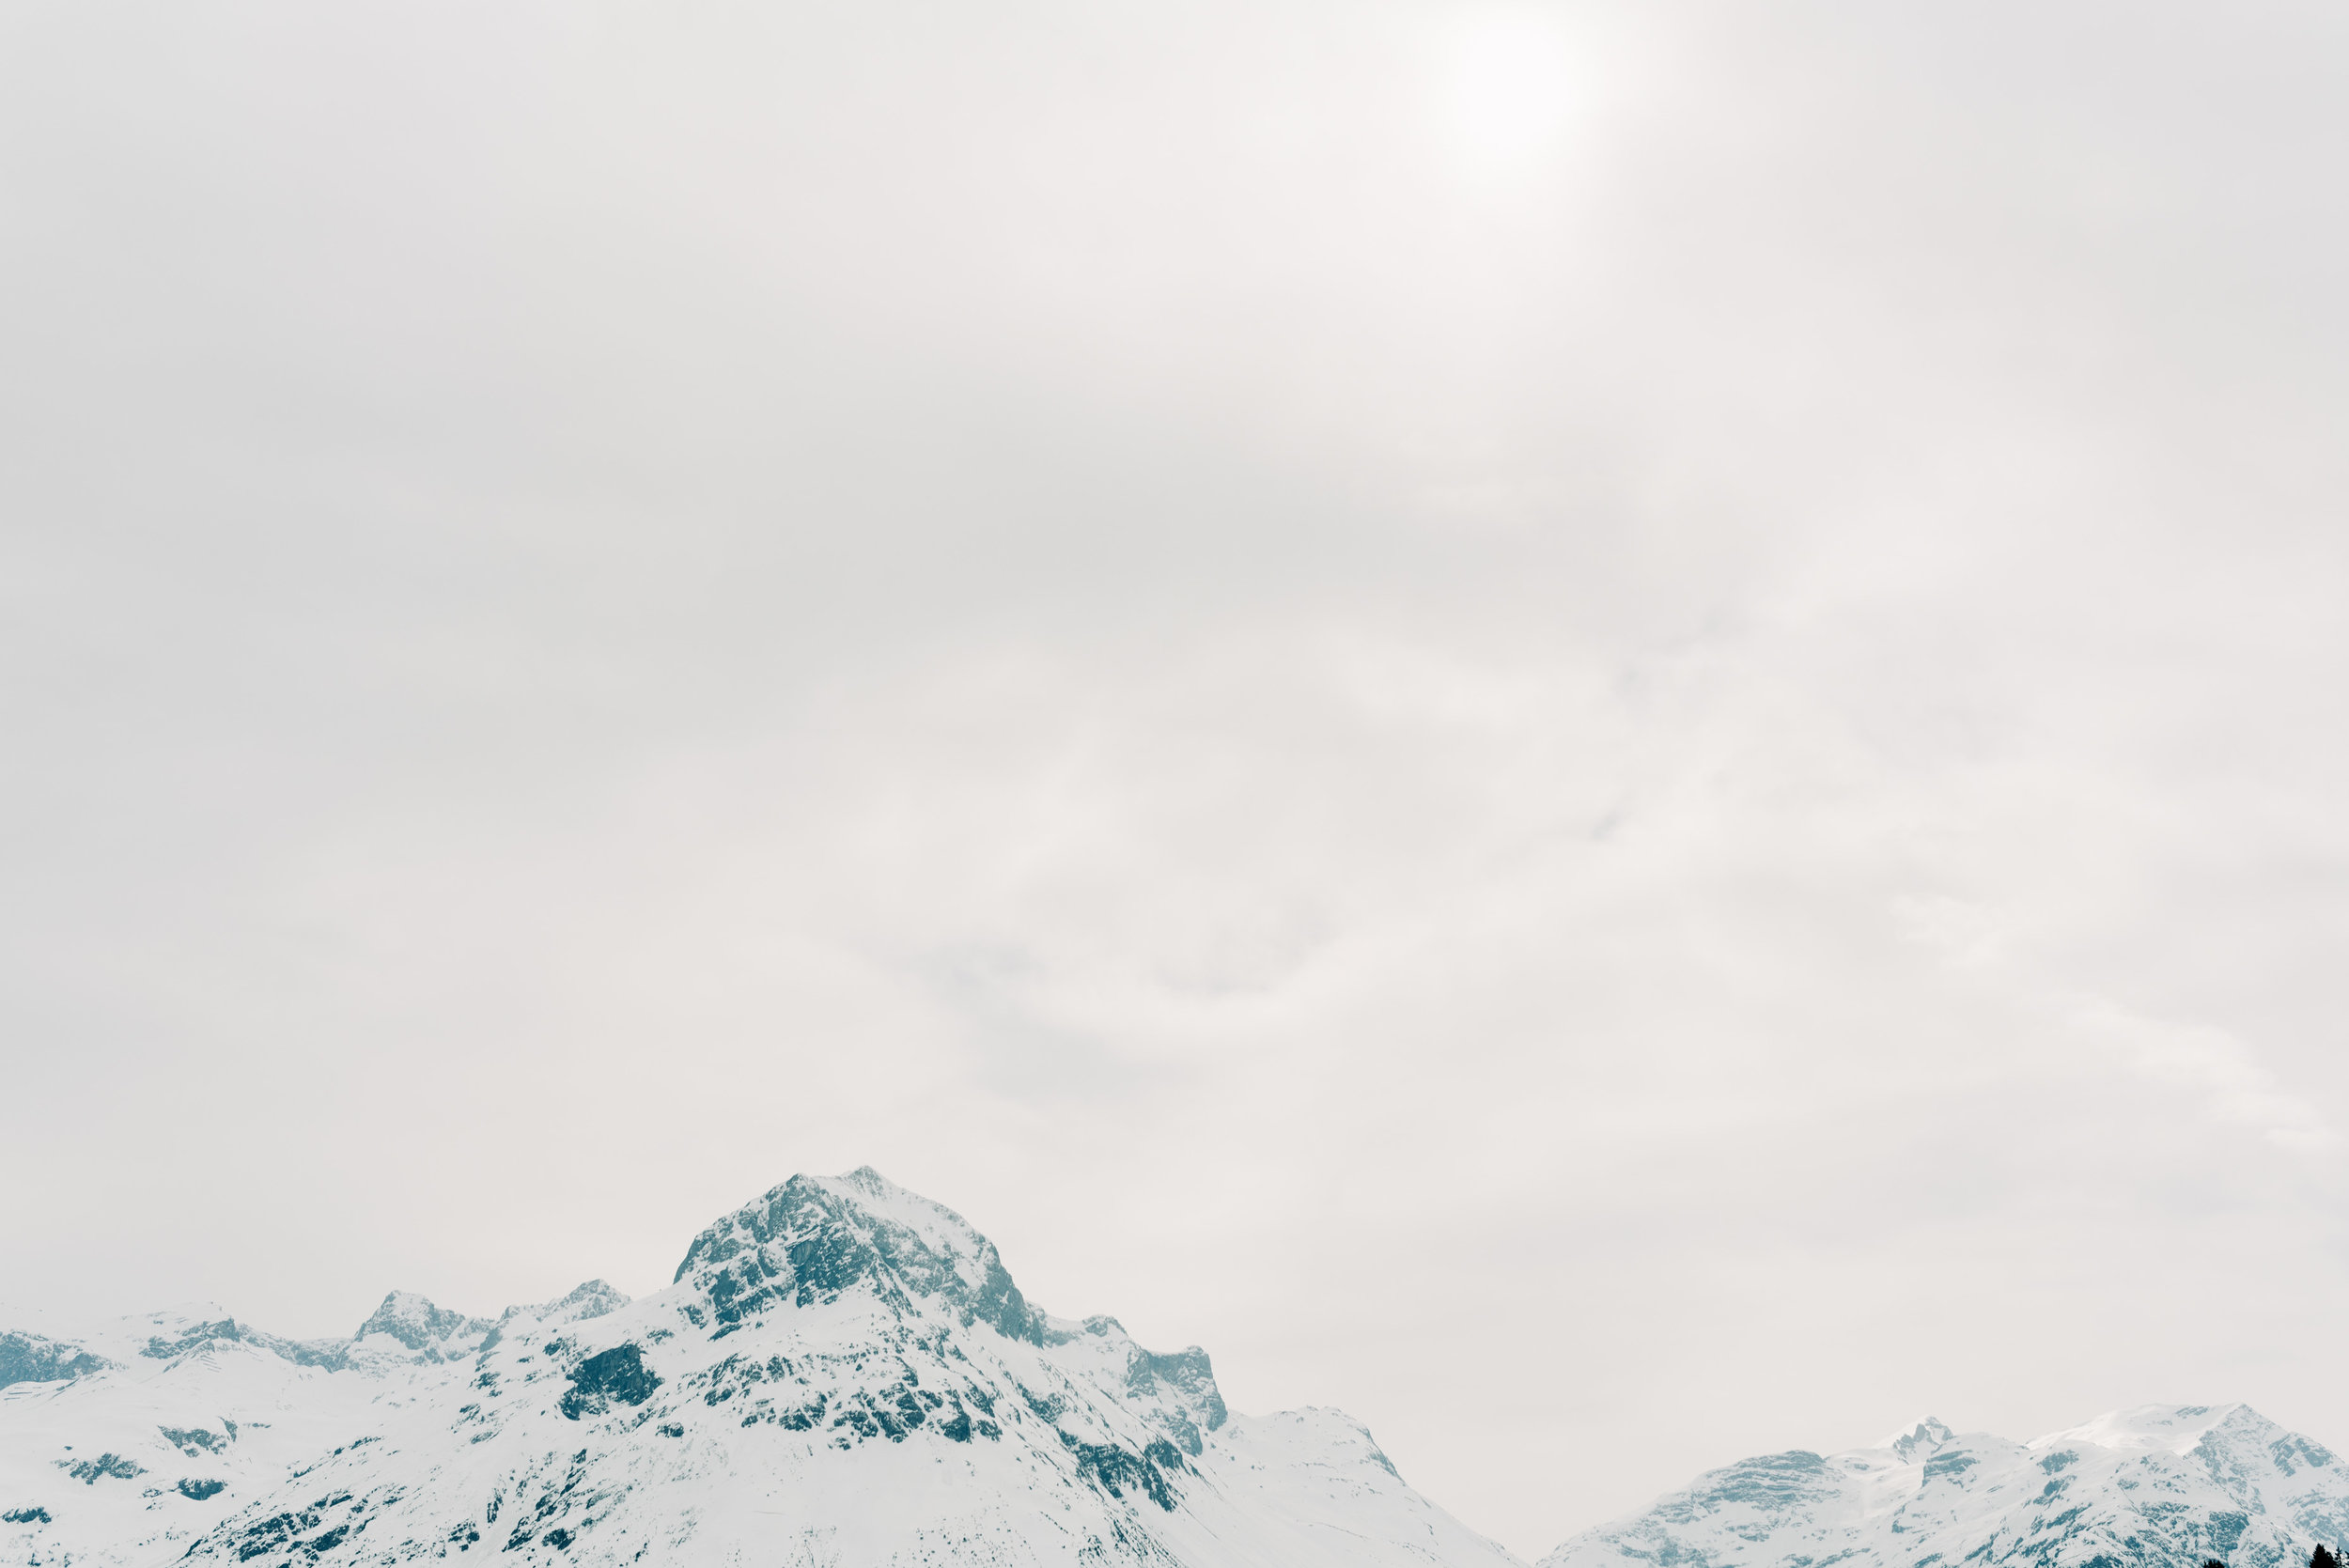 Winterhochzeit am Arlberg